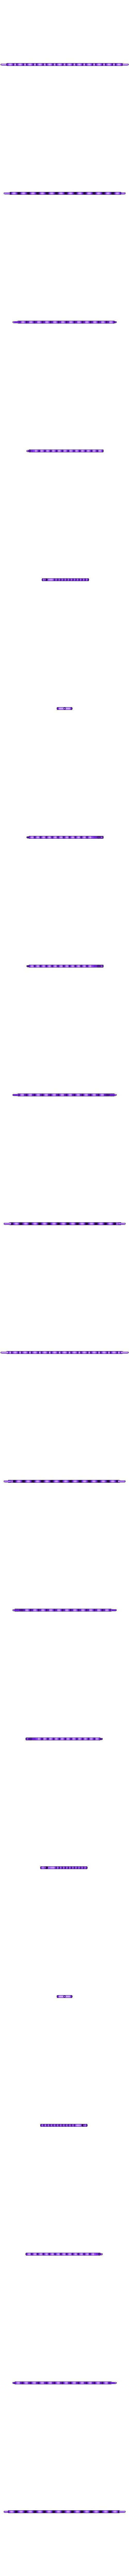 Female braid hair 04 B low.stl Download STL file female hair braid hair styling roller hair accessories for girl headdress weaving tool 3d print cnc • 3D printing object, Dzusto